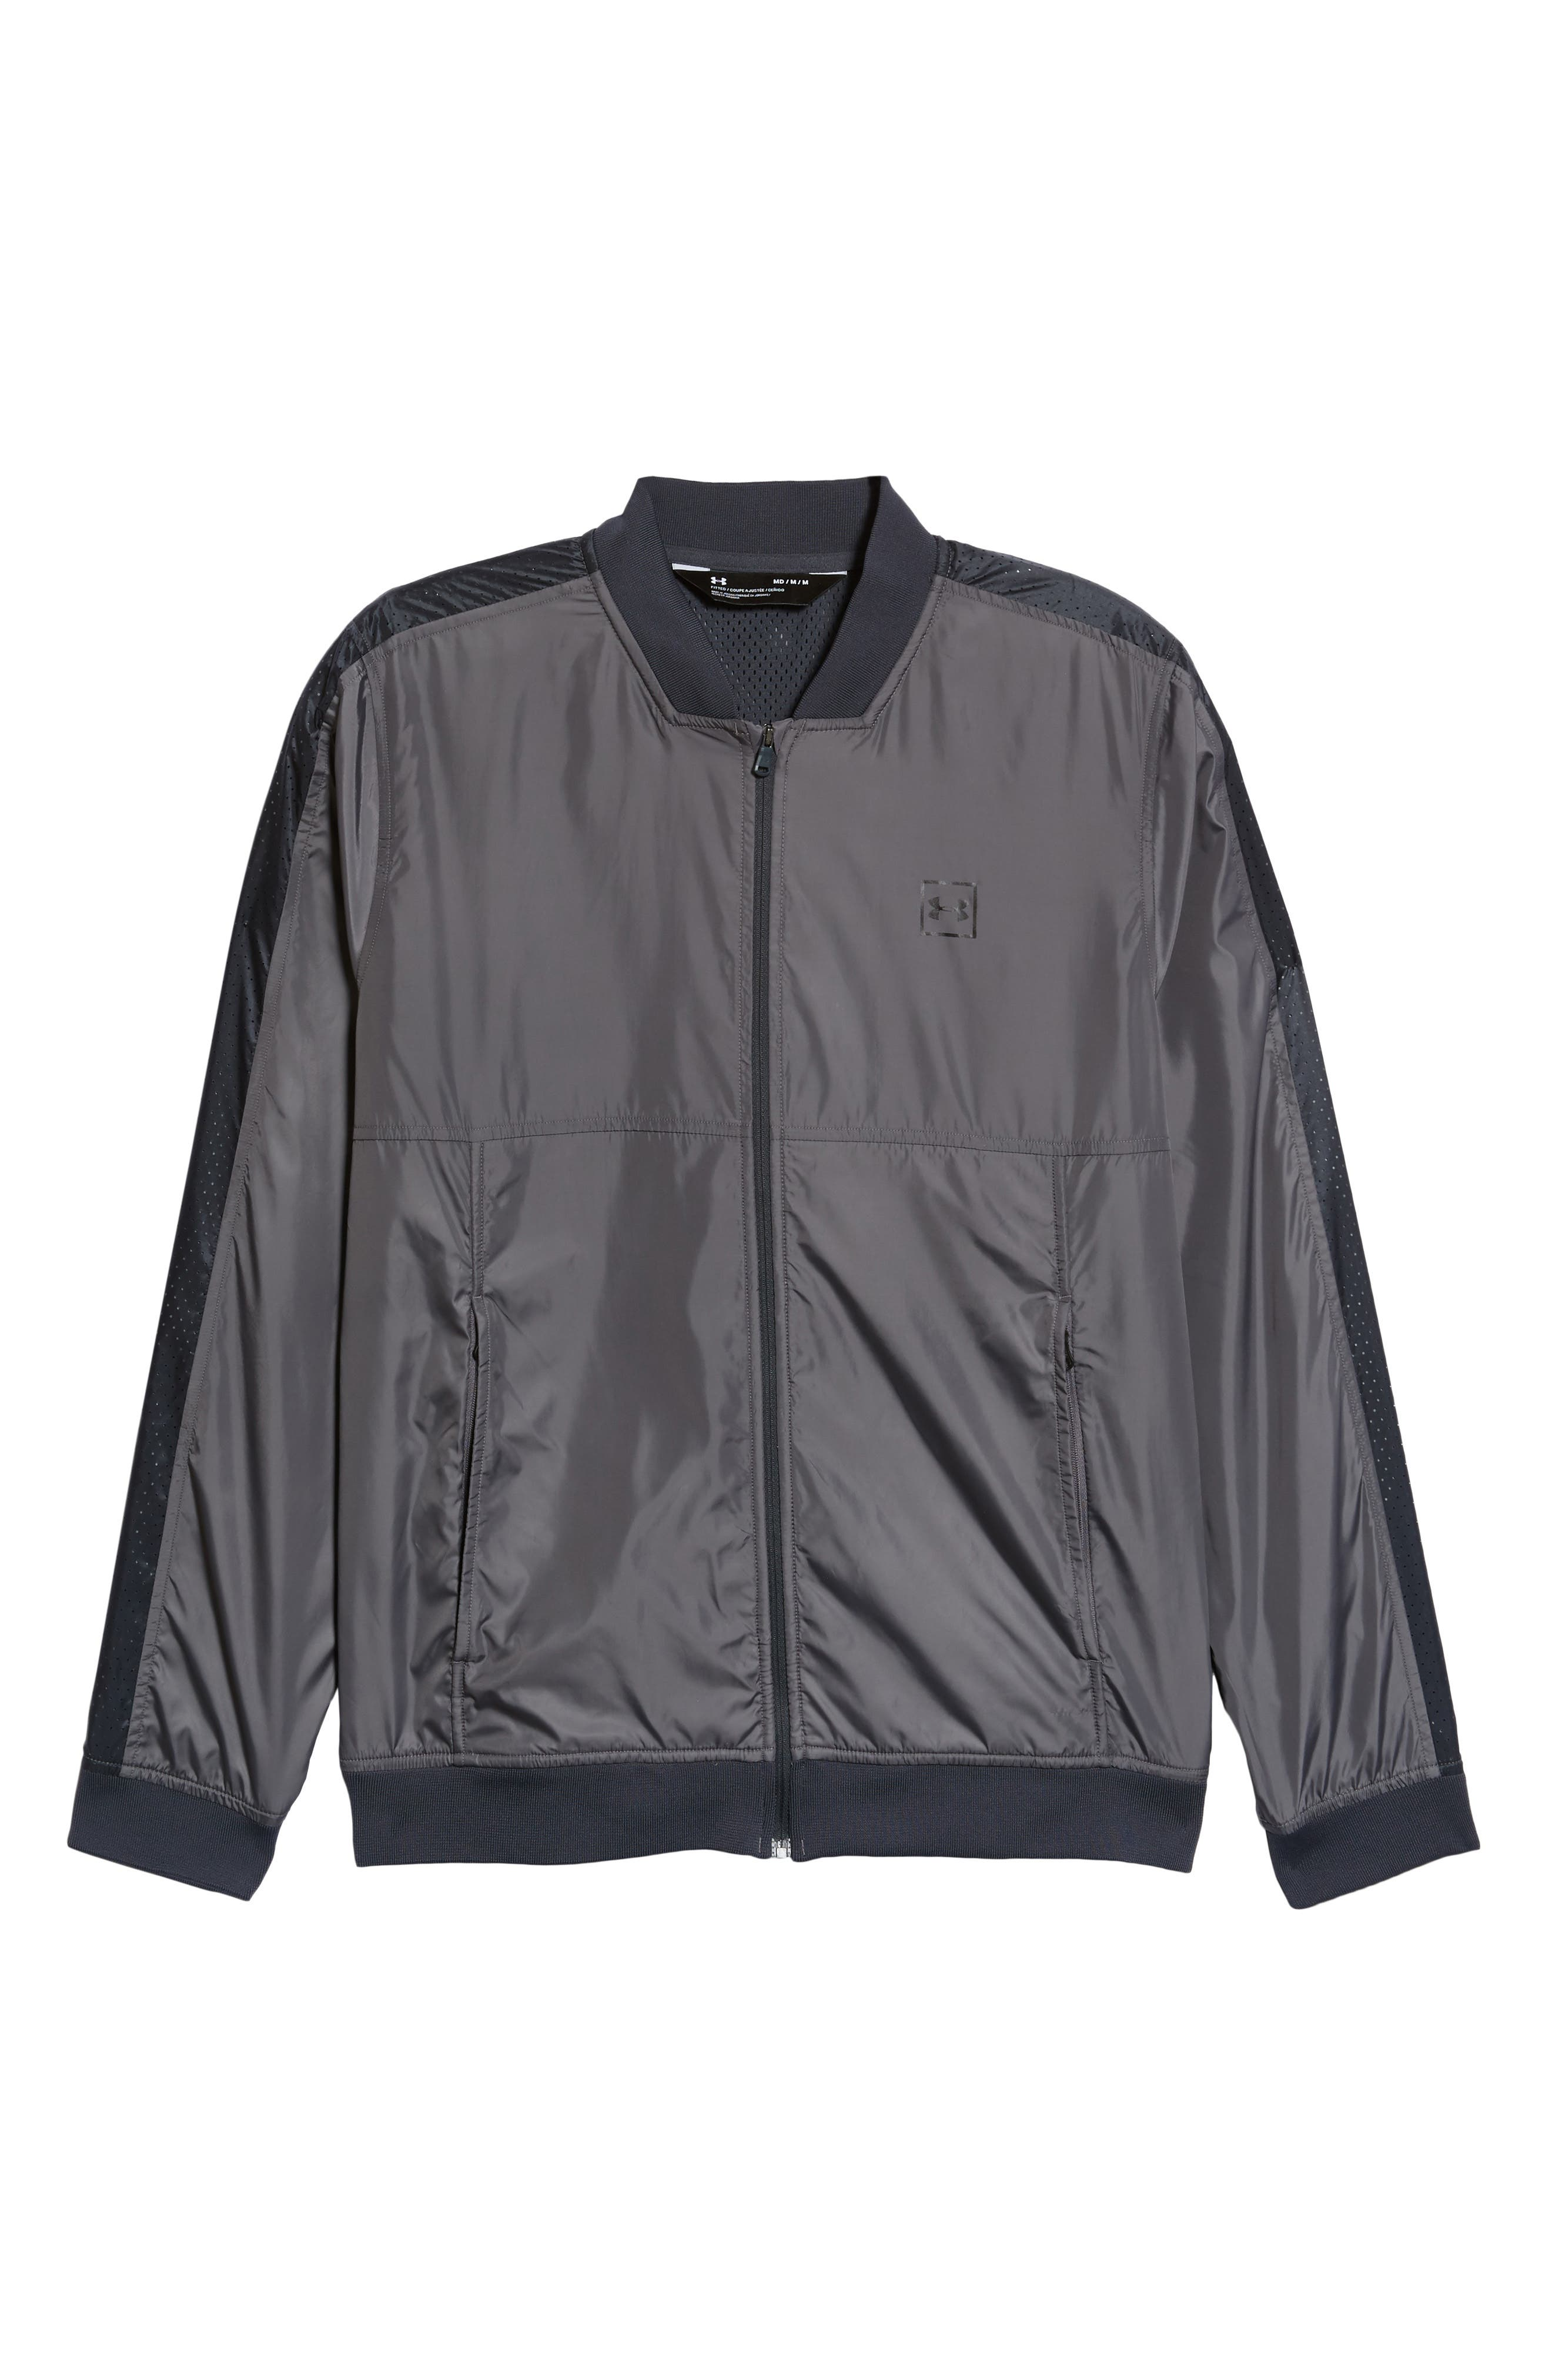 Sportstyle Wind Bomber Jacket,                             Alternate thumbnail 6, color,                             Graphite/ Black